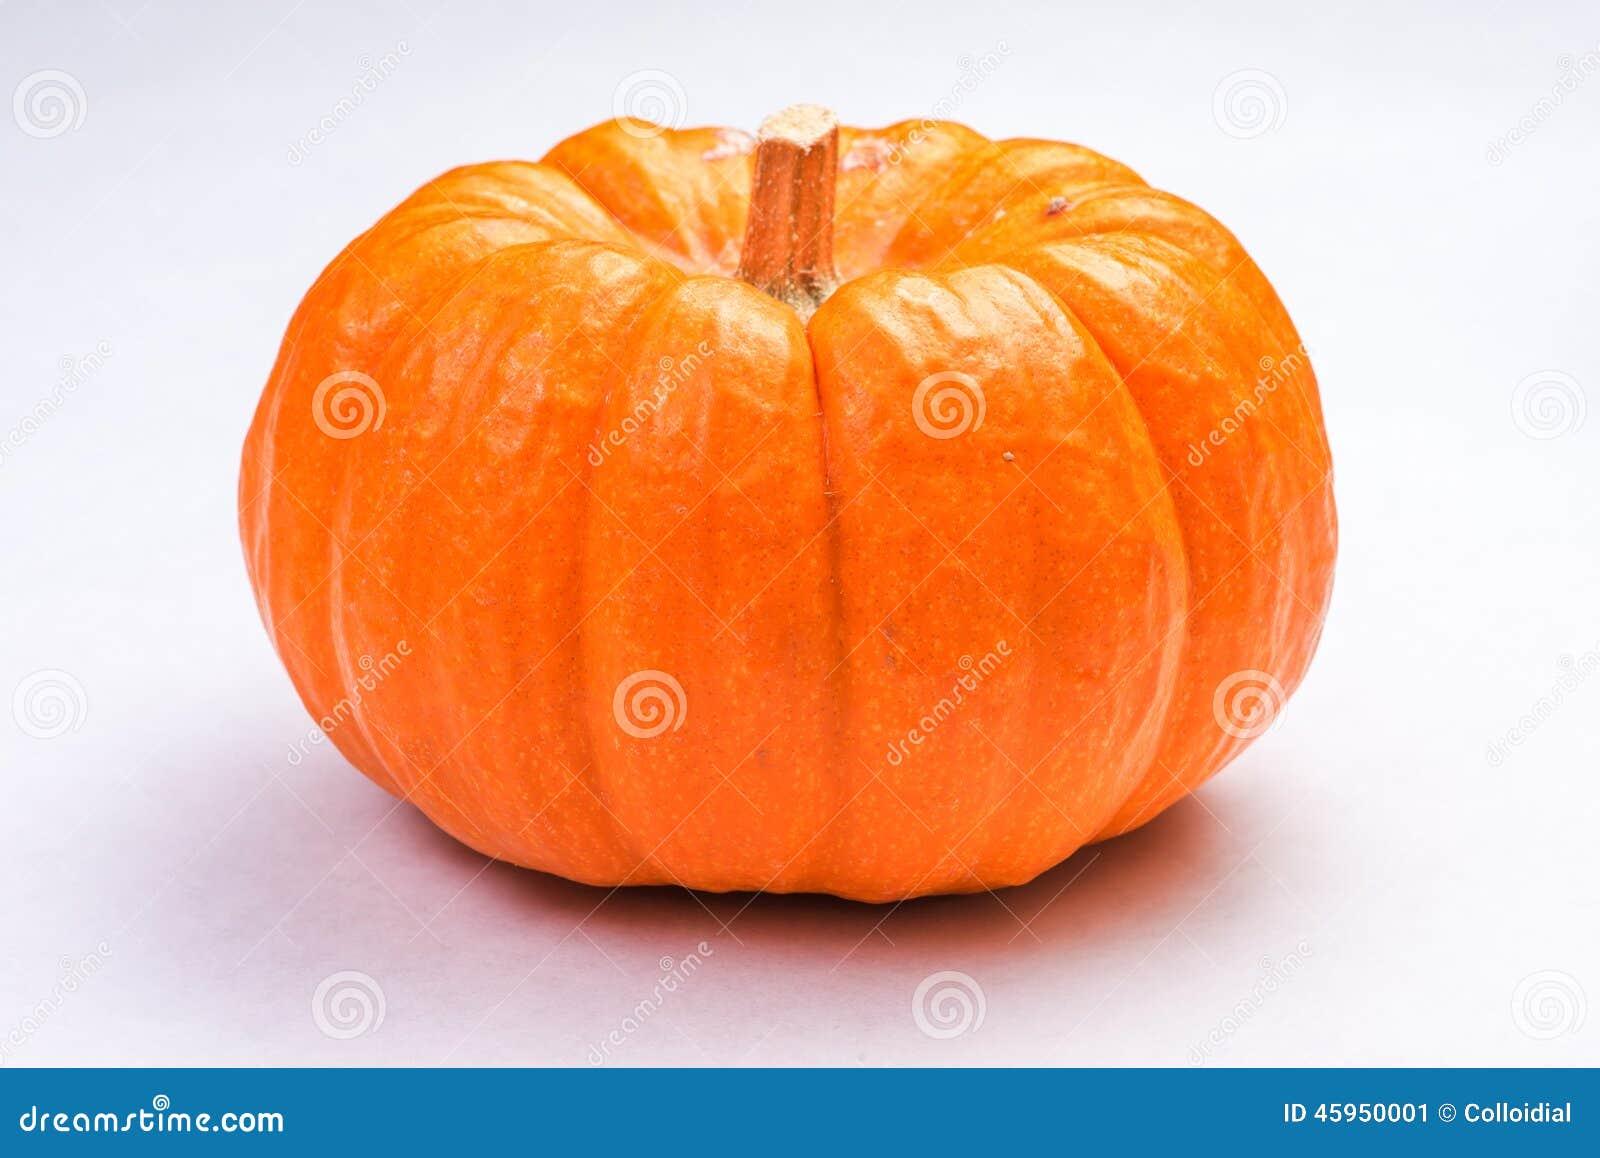 Mini-Pumpkin Stock Photo - Image: 45950001